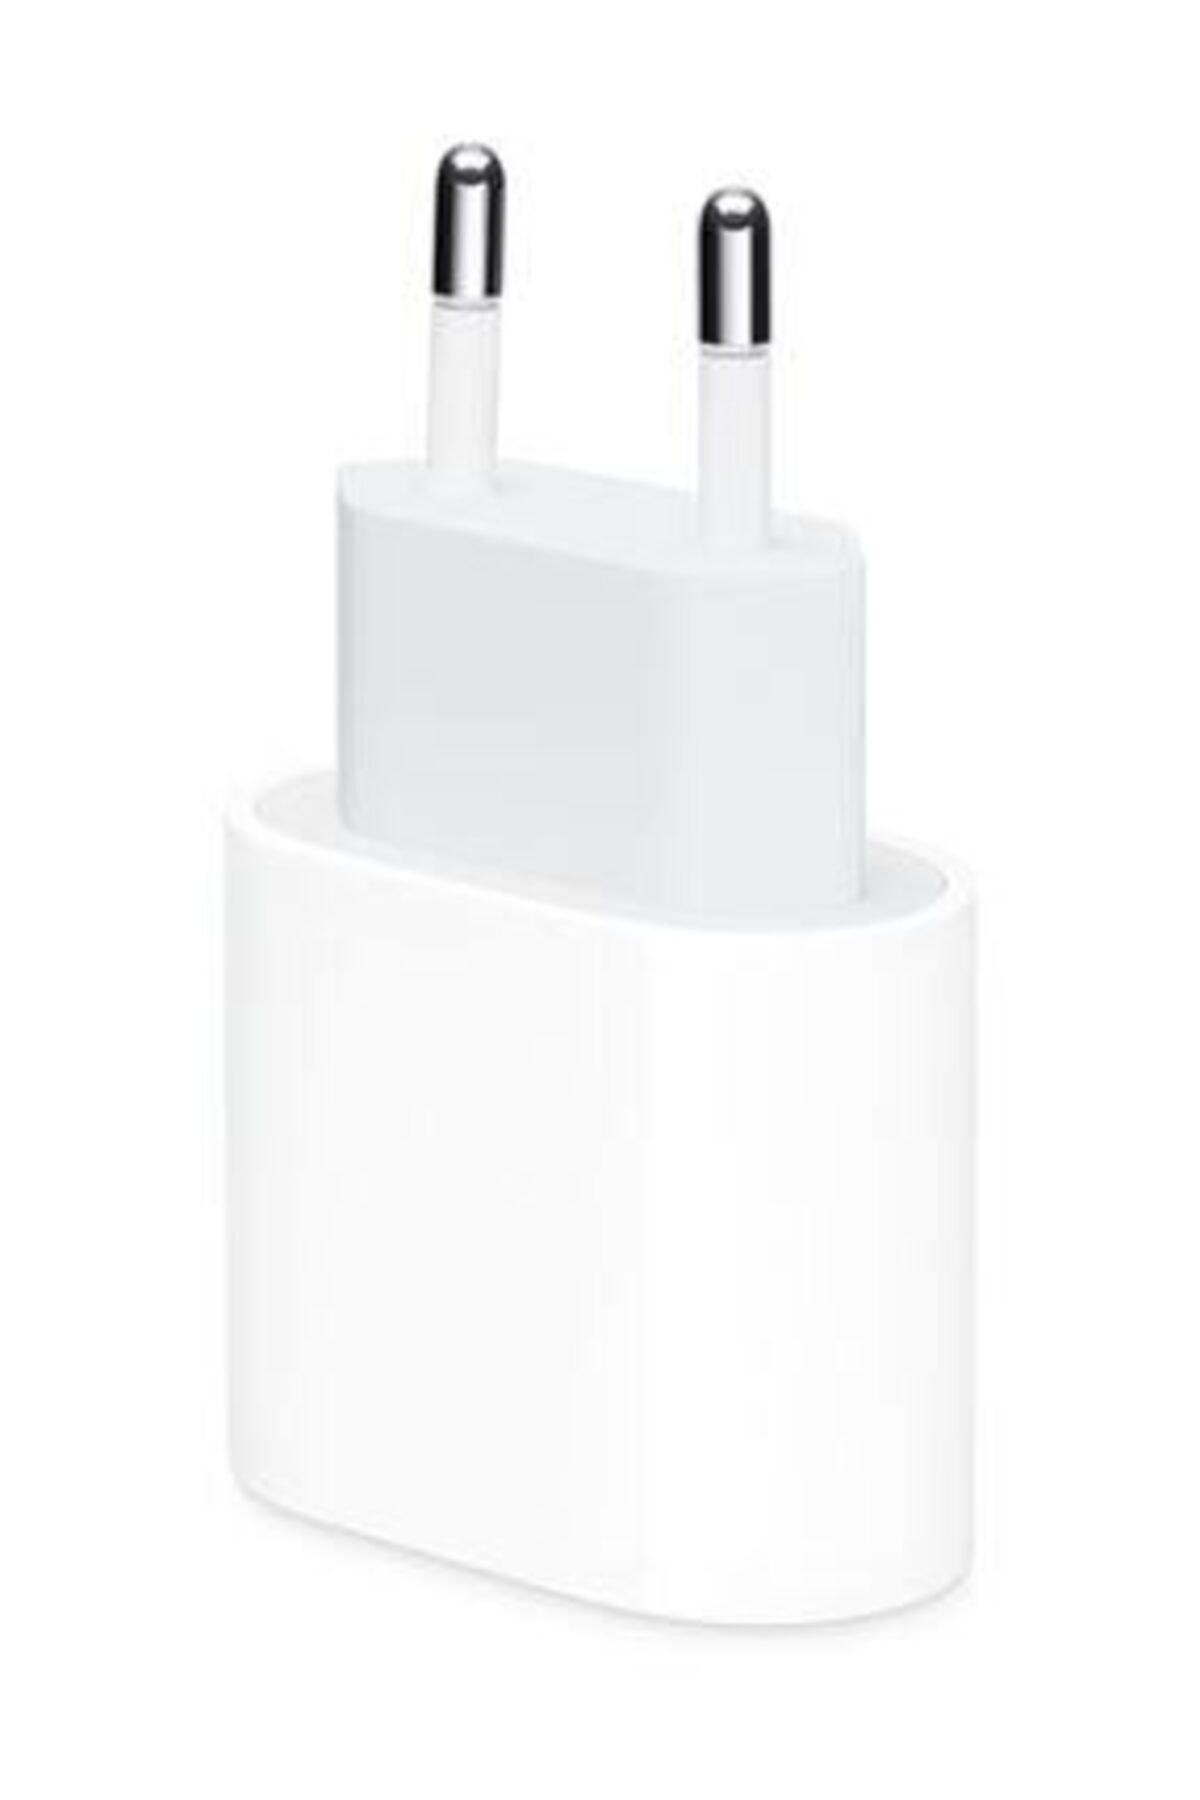 2K Original Apple Iphone Uyumlu 18 W Usb-c Güç Adaptörü (Hızlı Şarj) 1